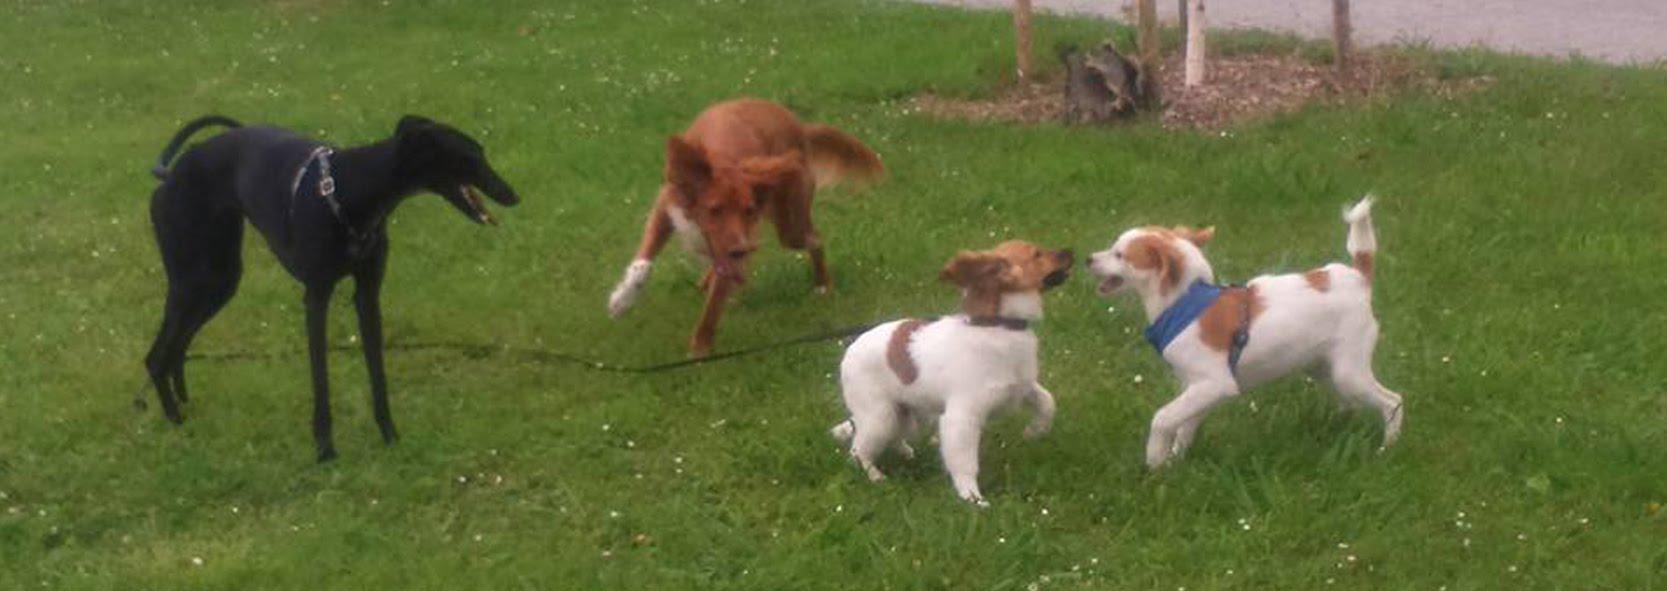 cachorros jugando educacion canina ana masoliver